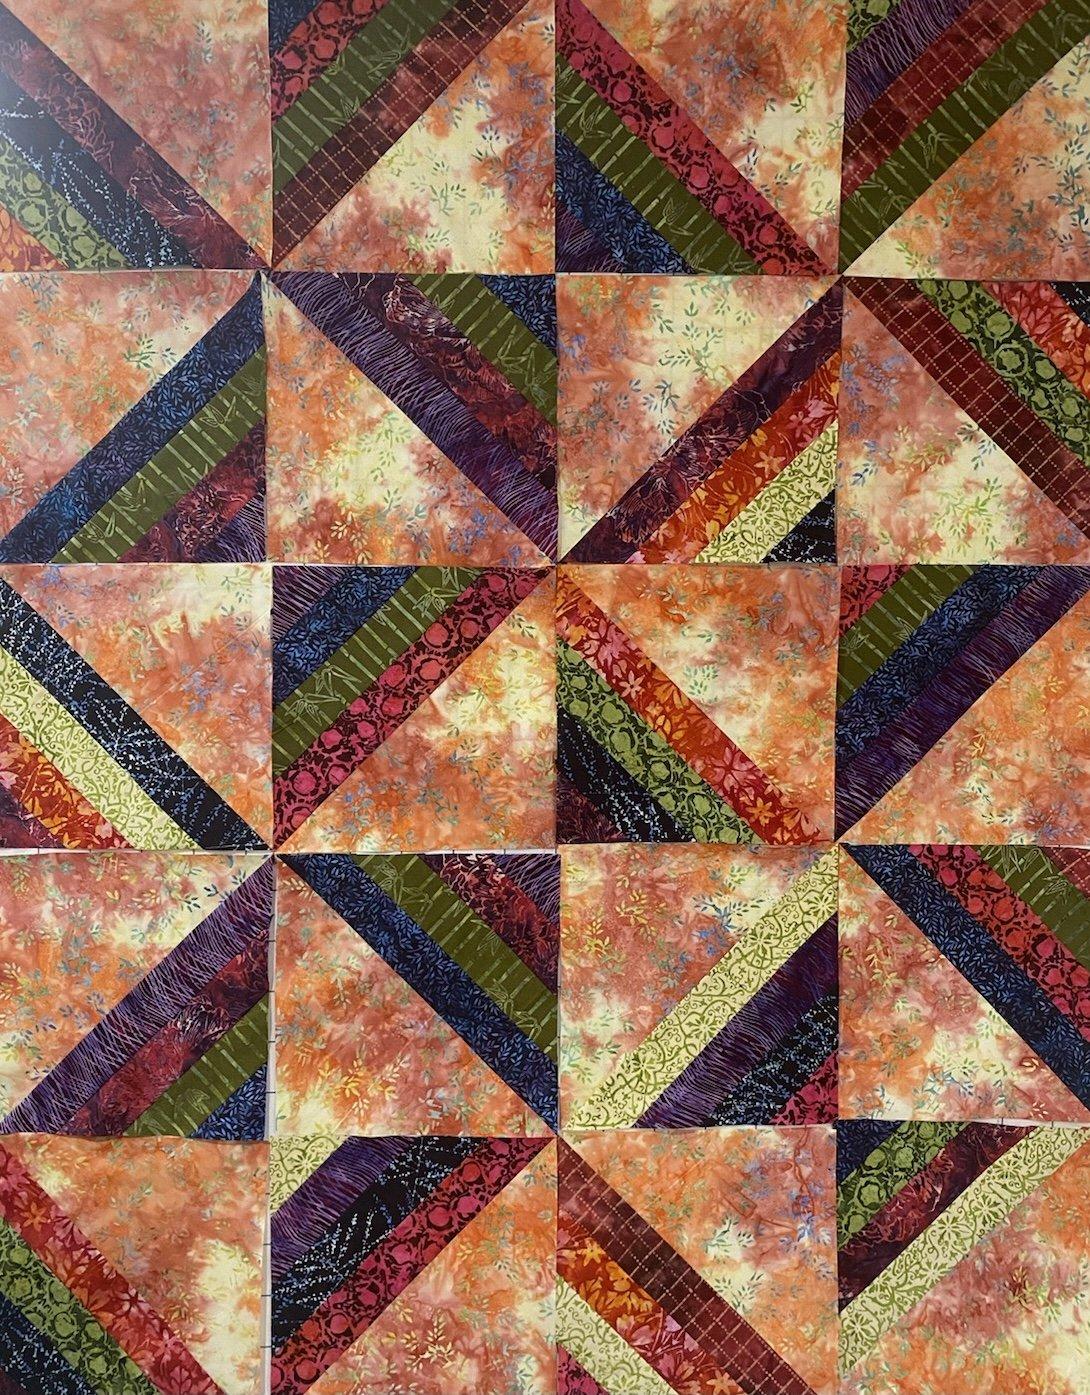 Double Decker printed pattern